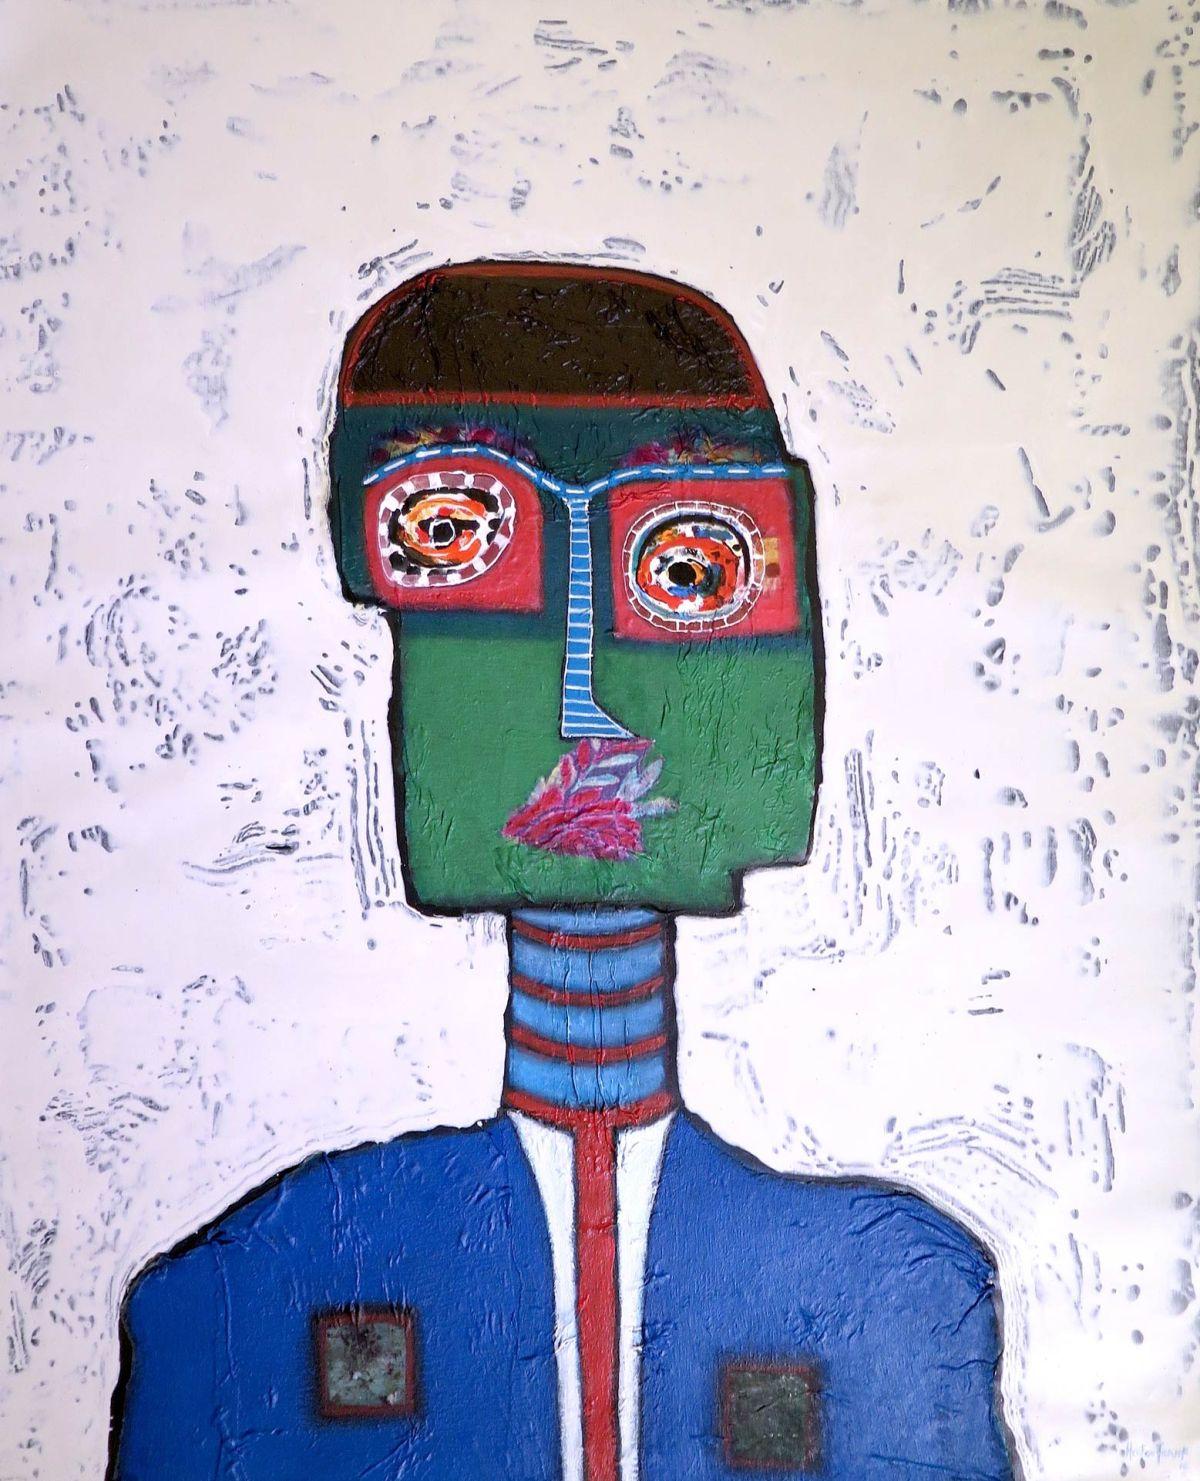 bryant-toth-fine-art-hector-frank-exhibition-8